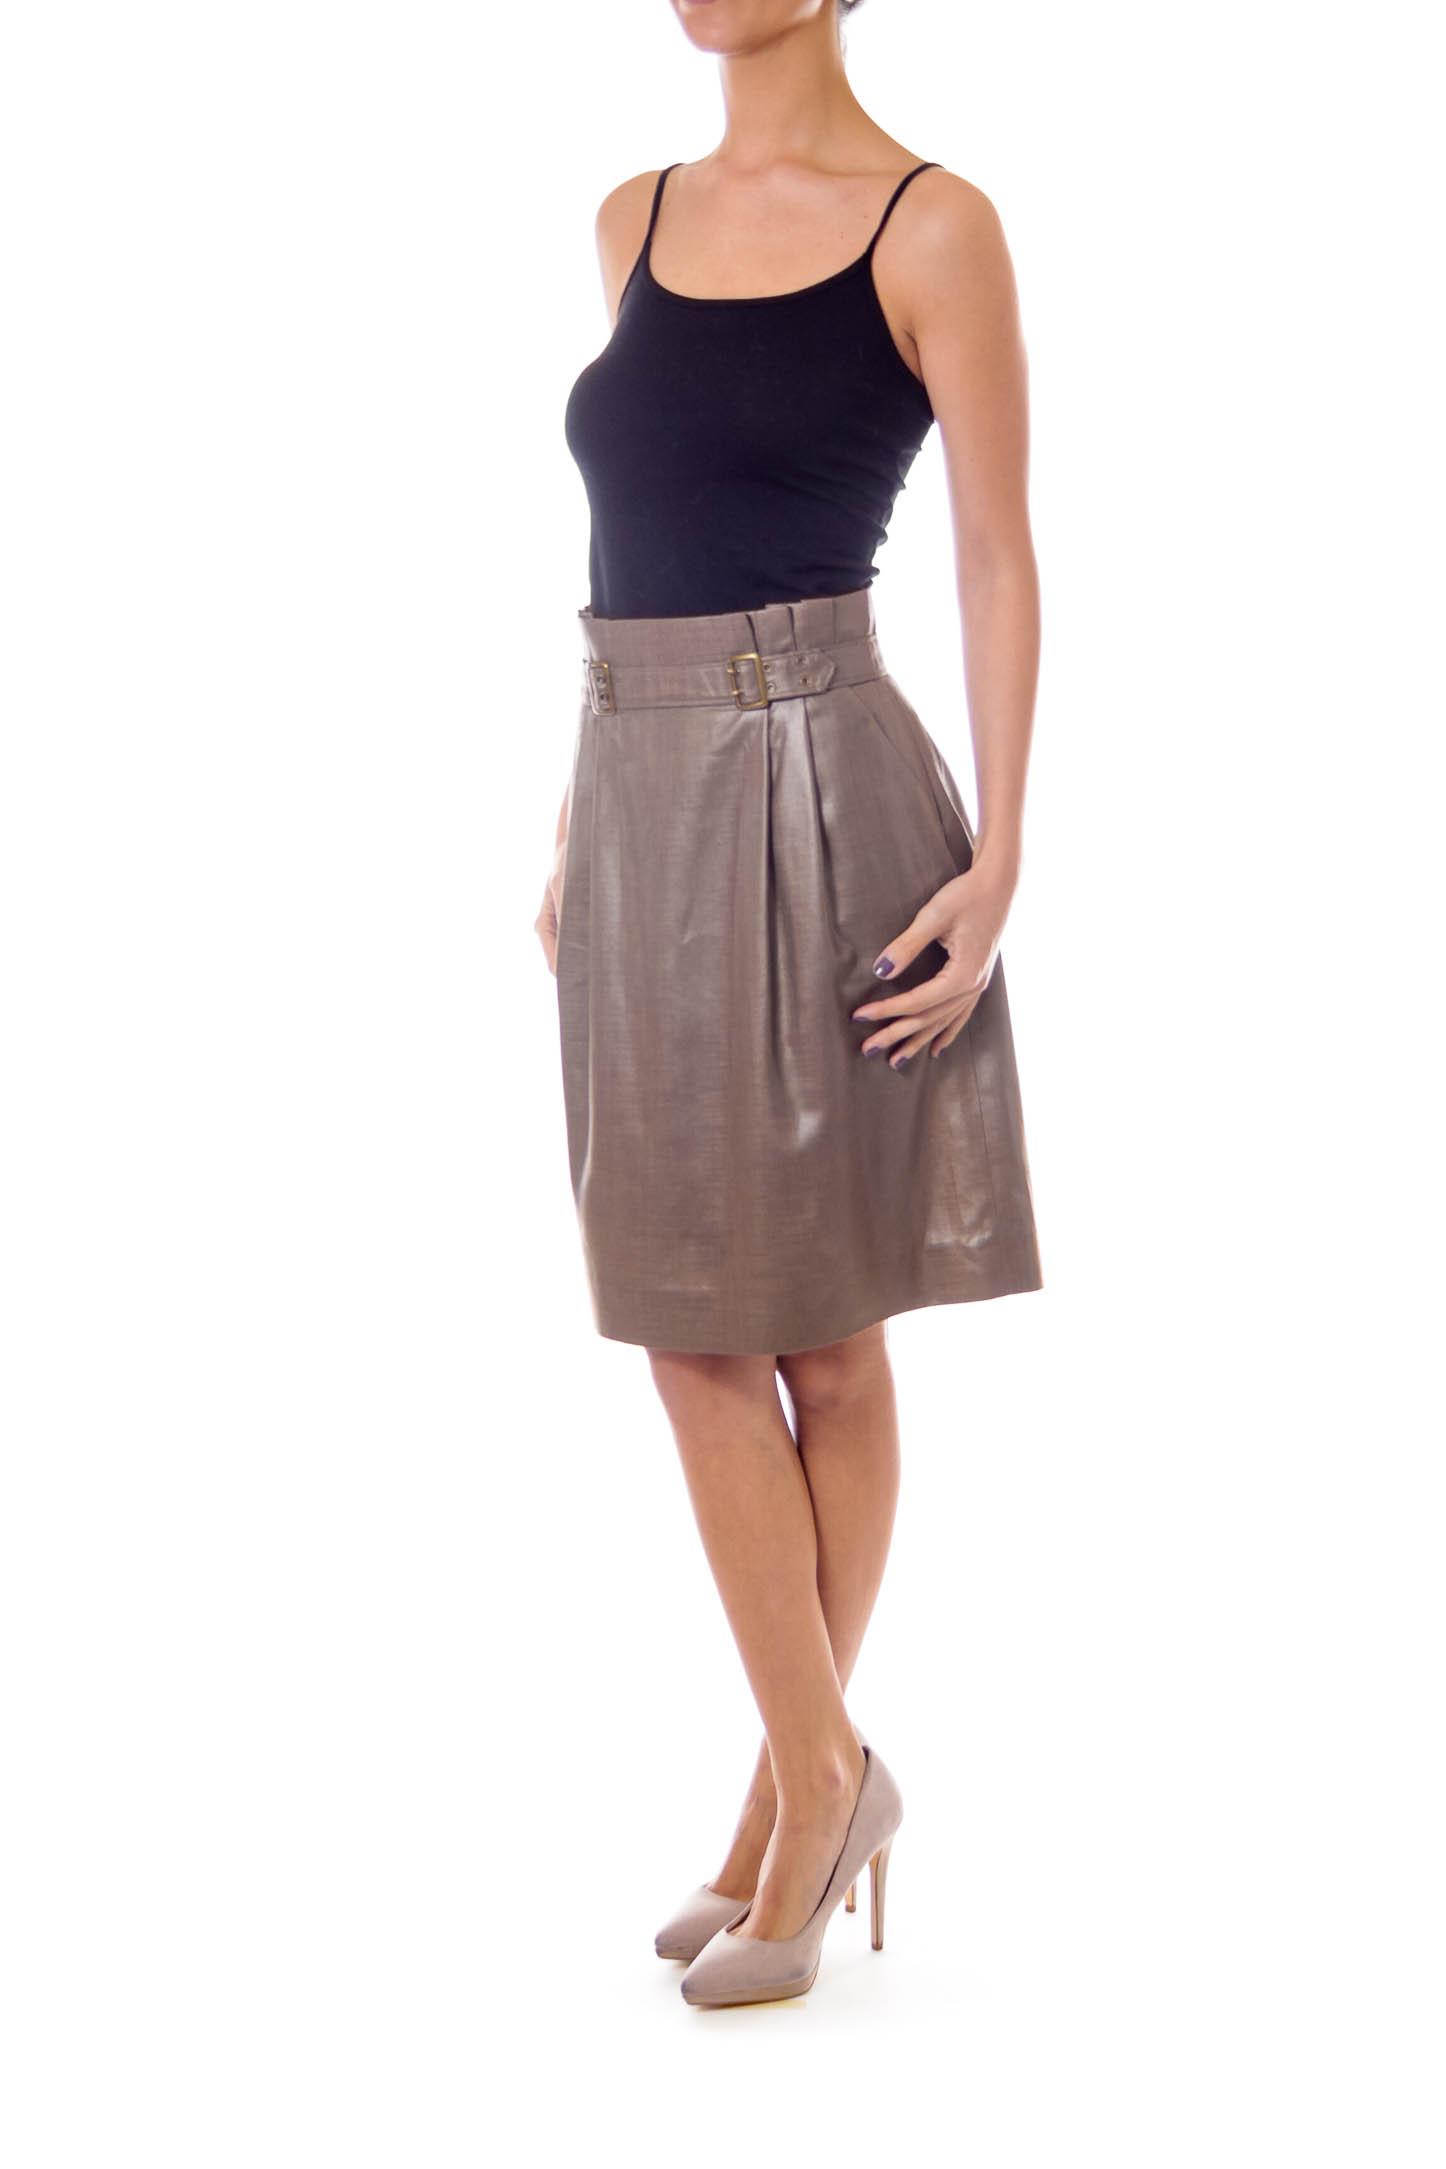 Taupe Shiny High Waist Buckled Skirt